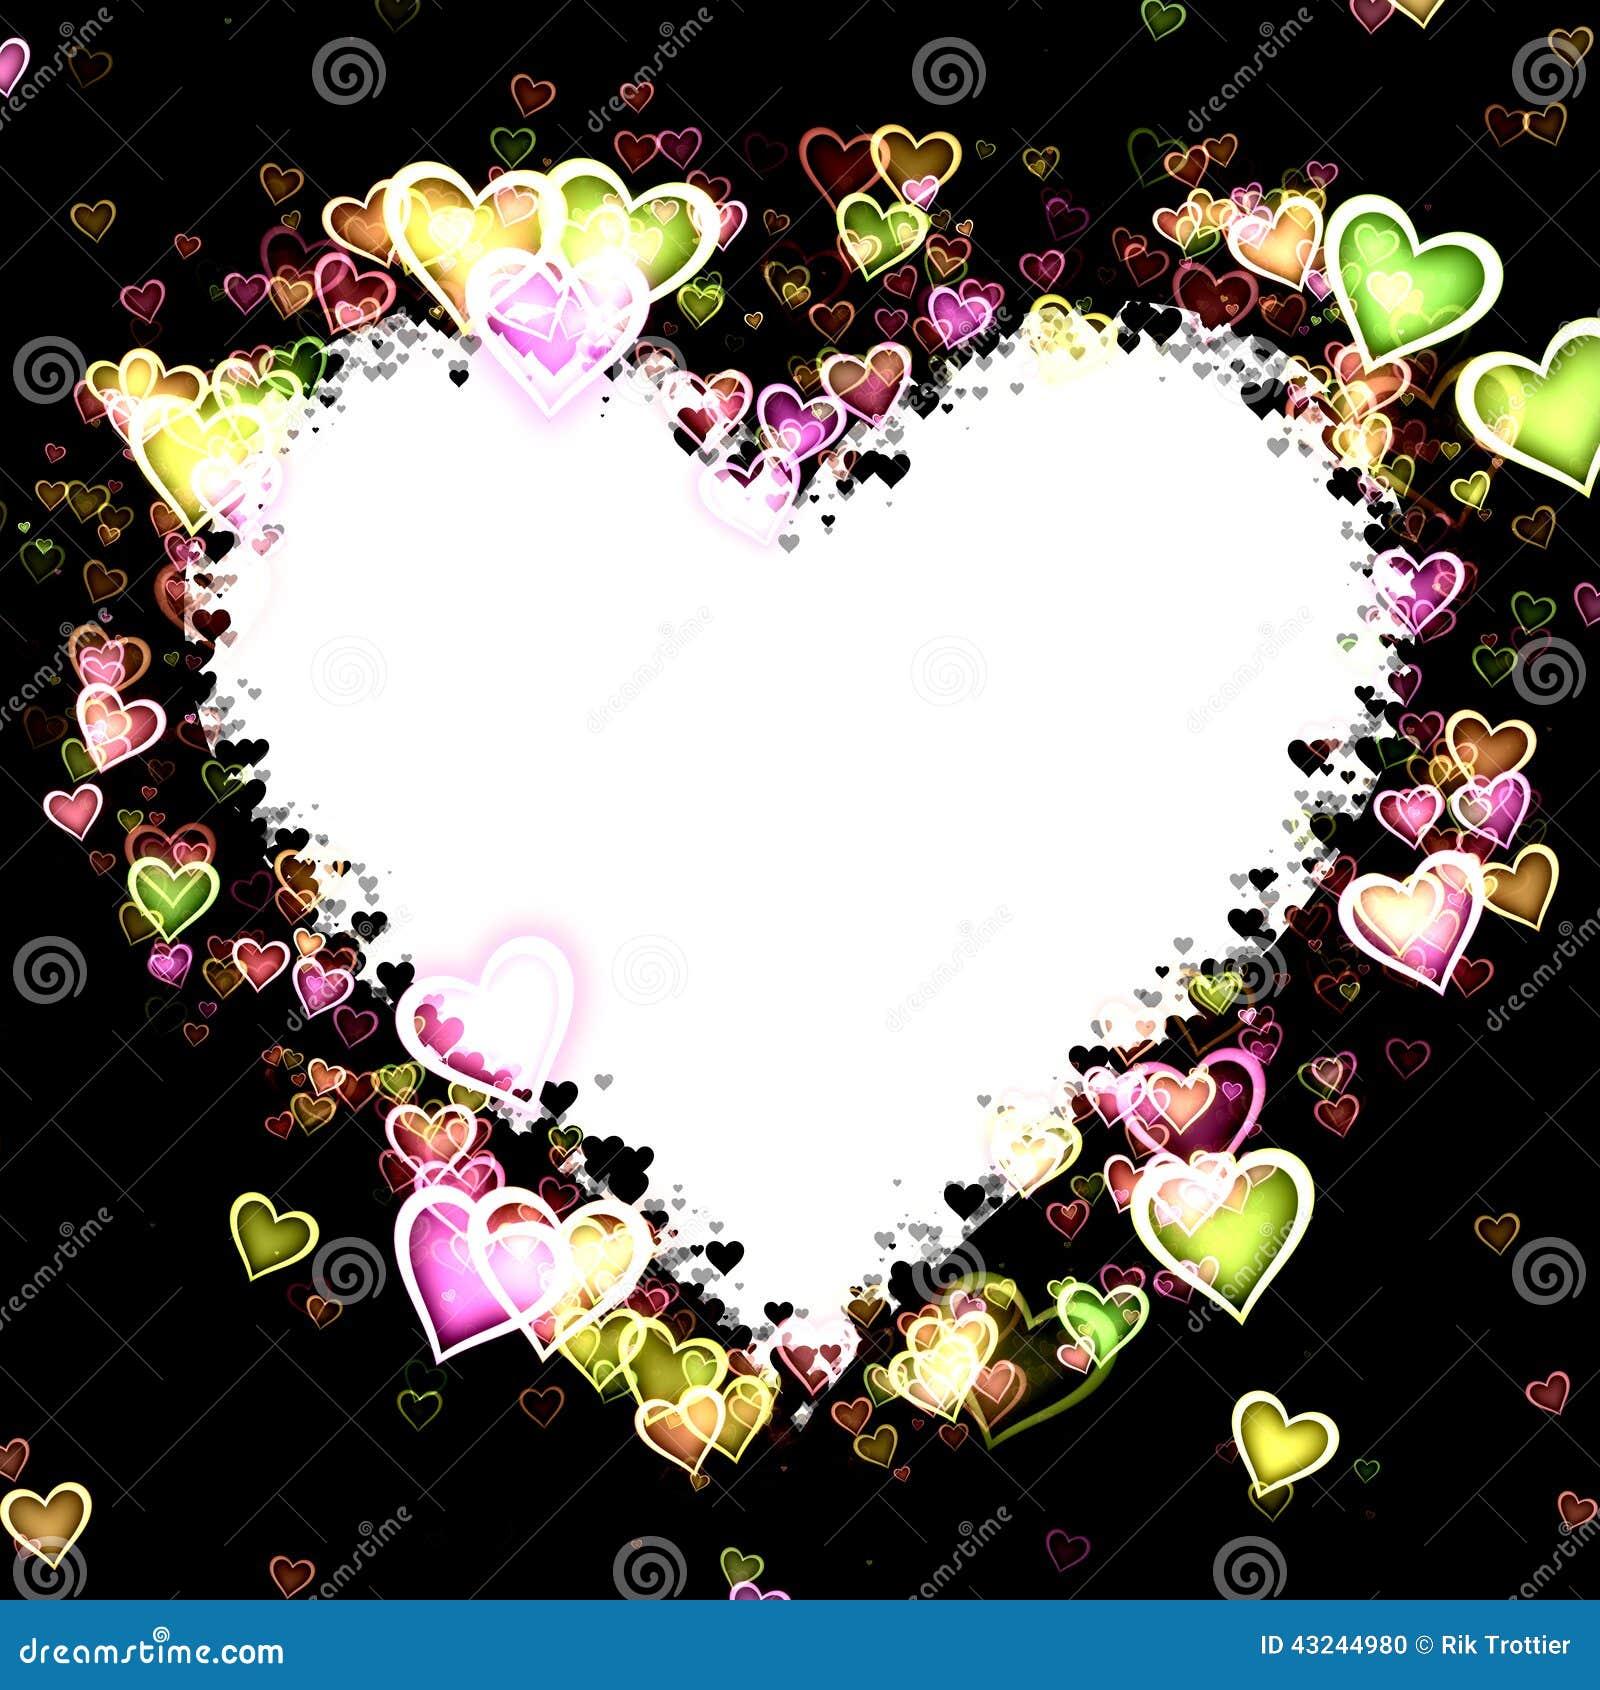 Heart Frame stock photo. Illustration of black, hearts - 43244980